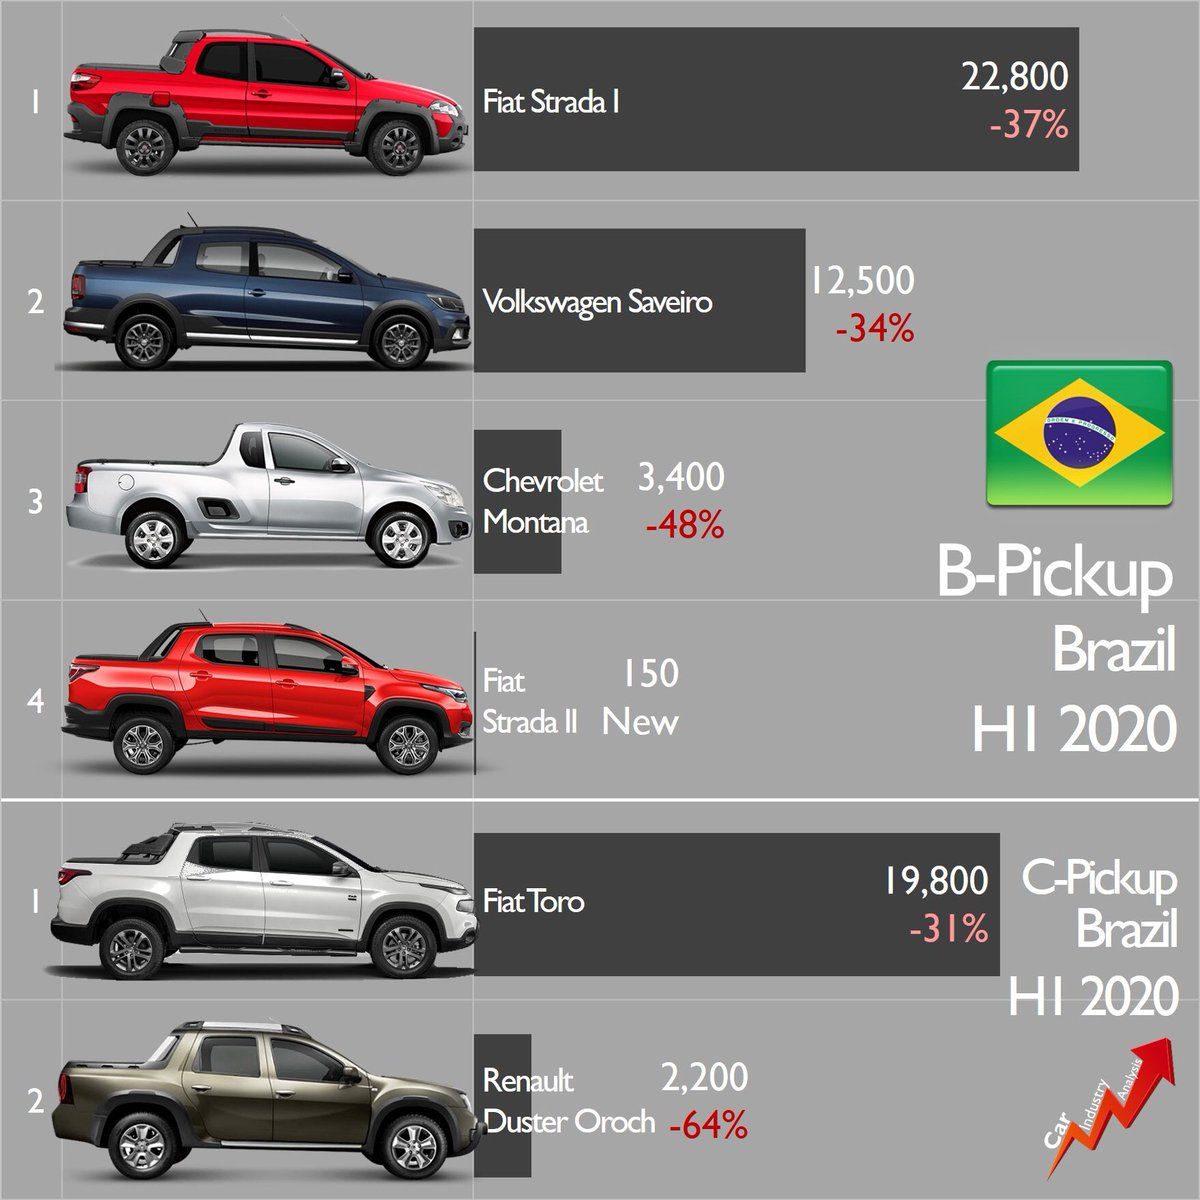 [Statistiques] Les chiffres sud/nord américains  - Page 4 EegT7gMXkAETGvQ?format=jpg